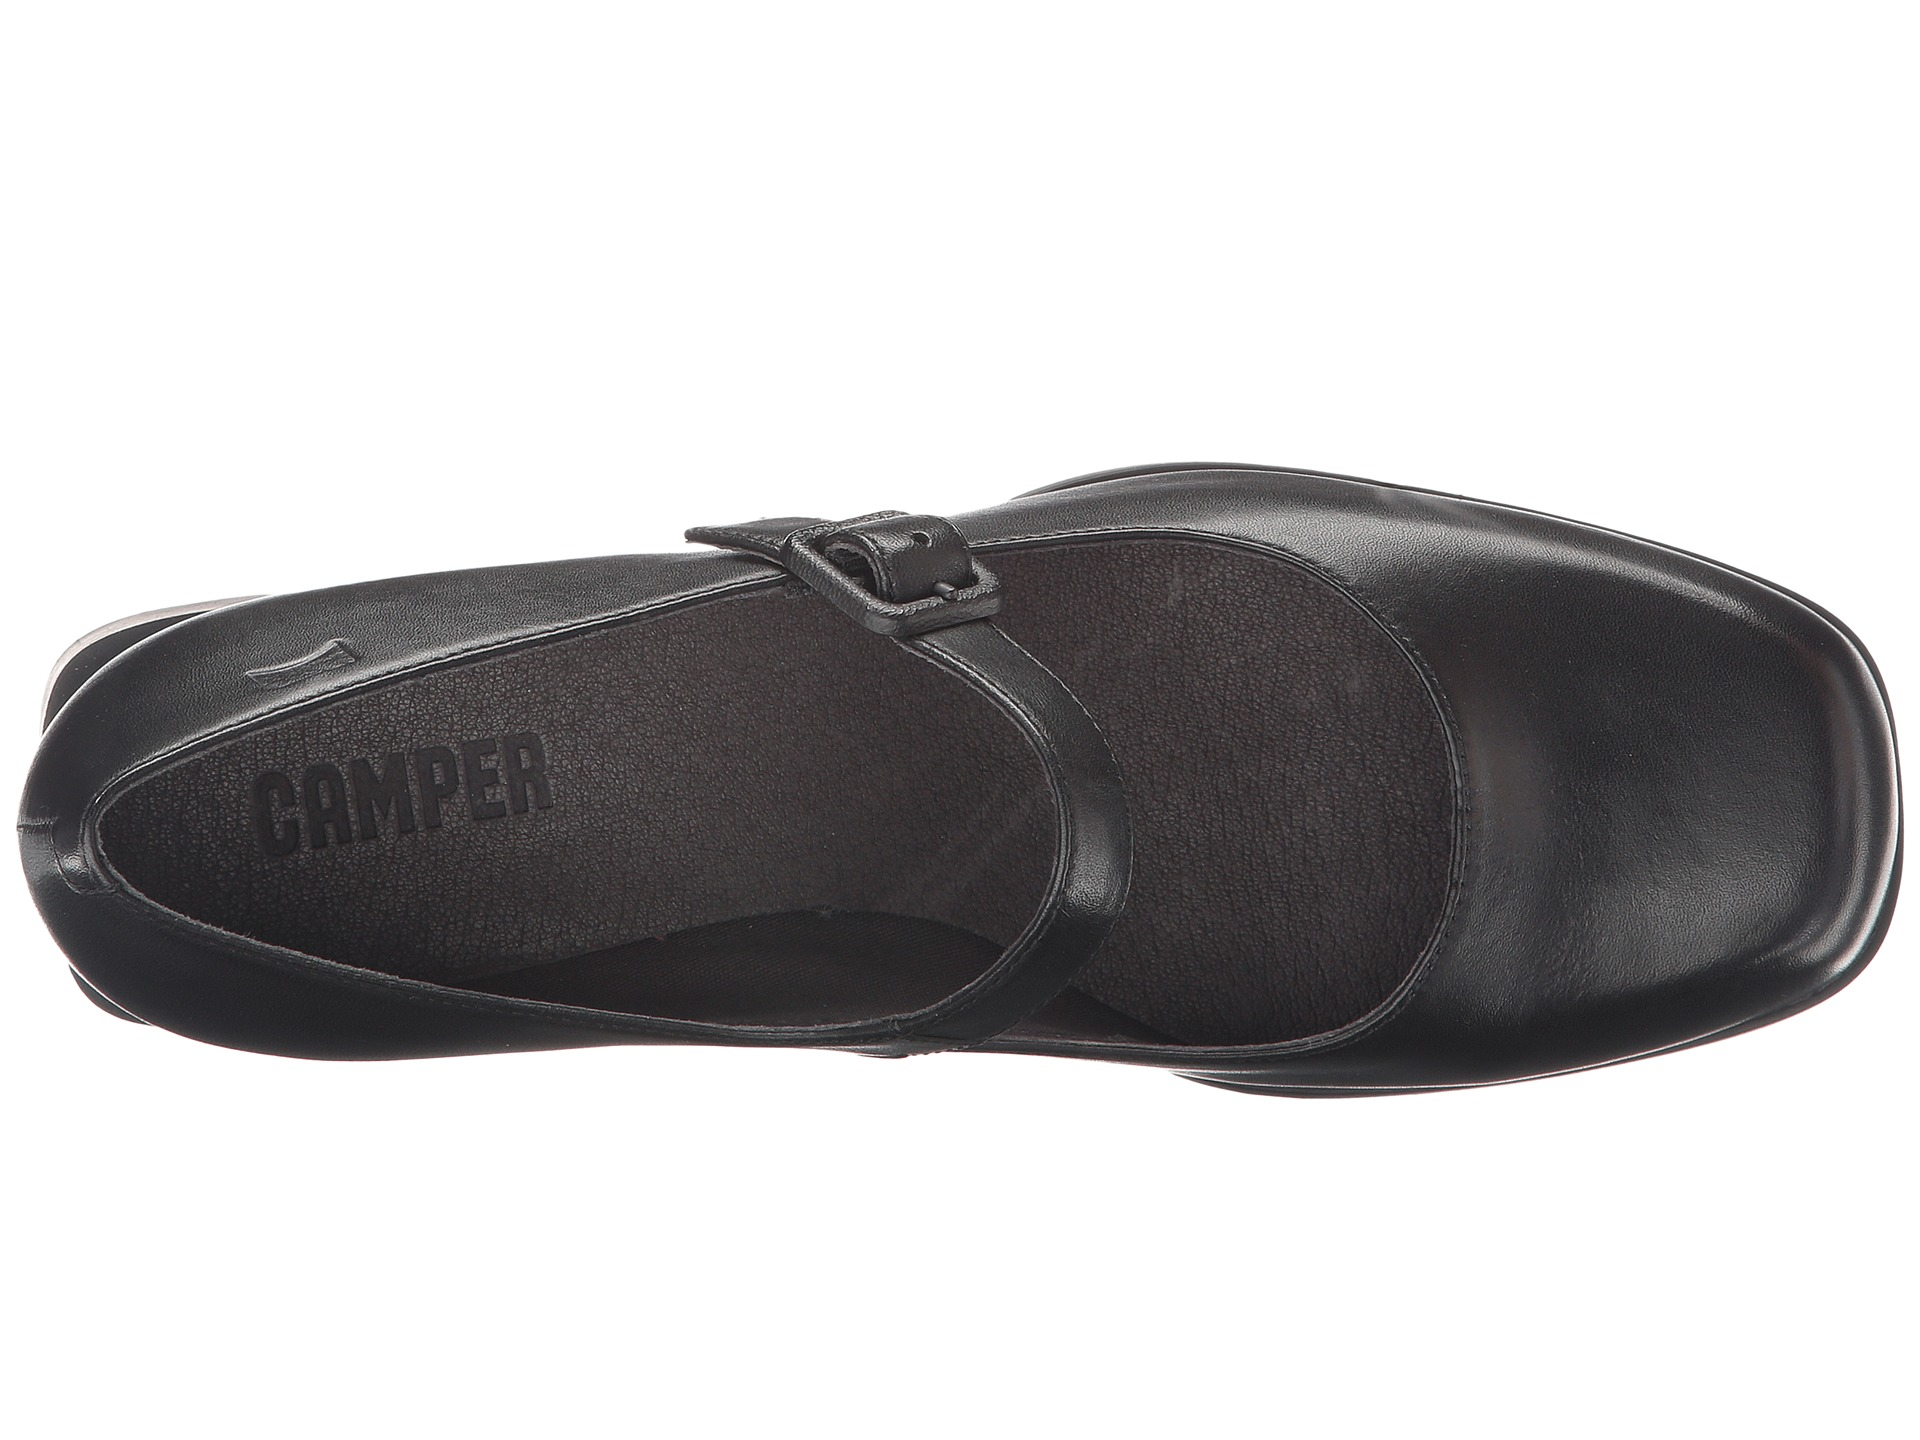 Camper Kobo Shoe Review